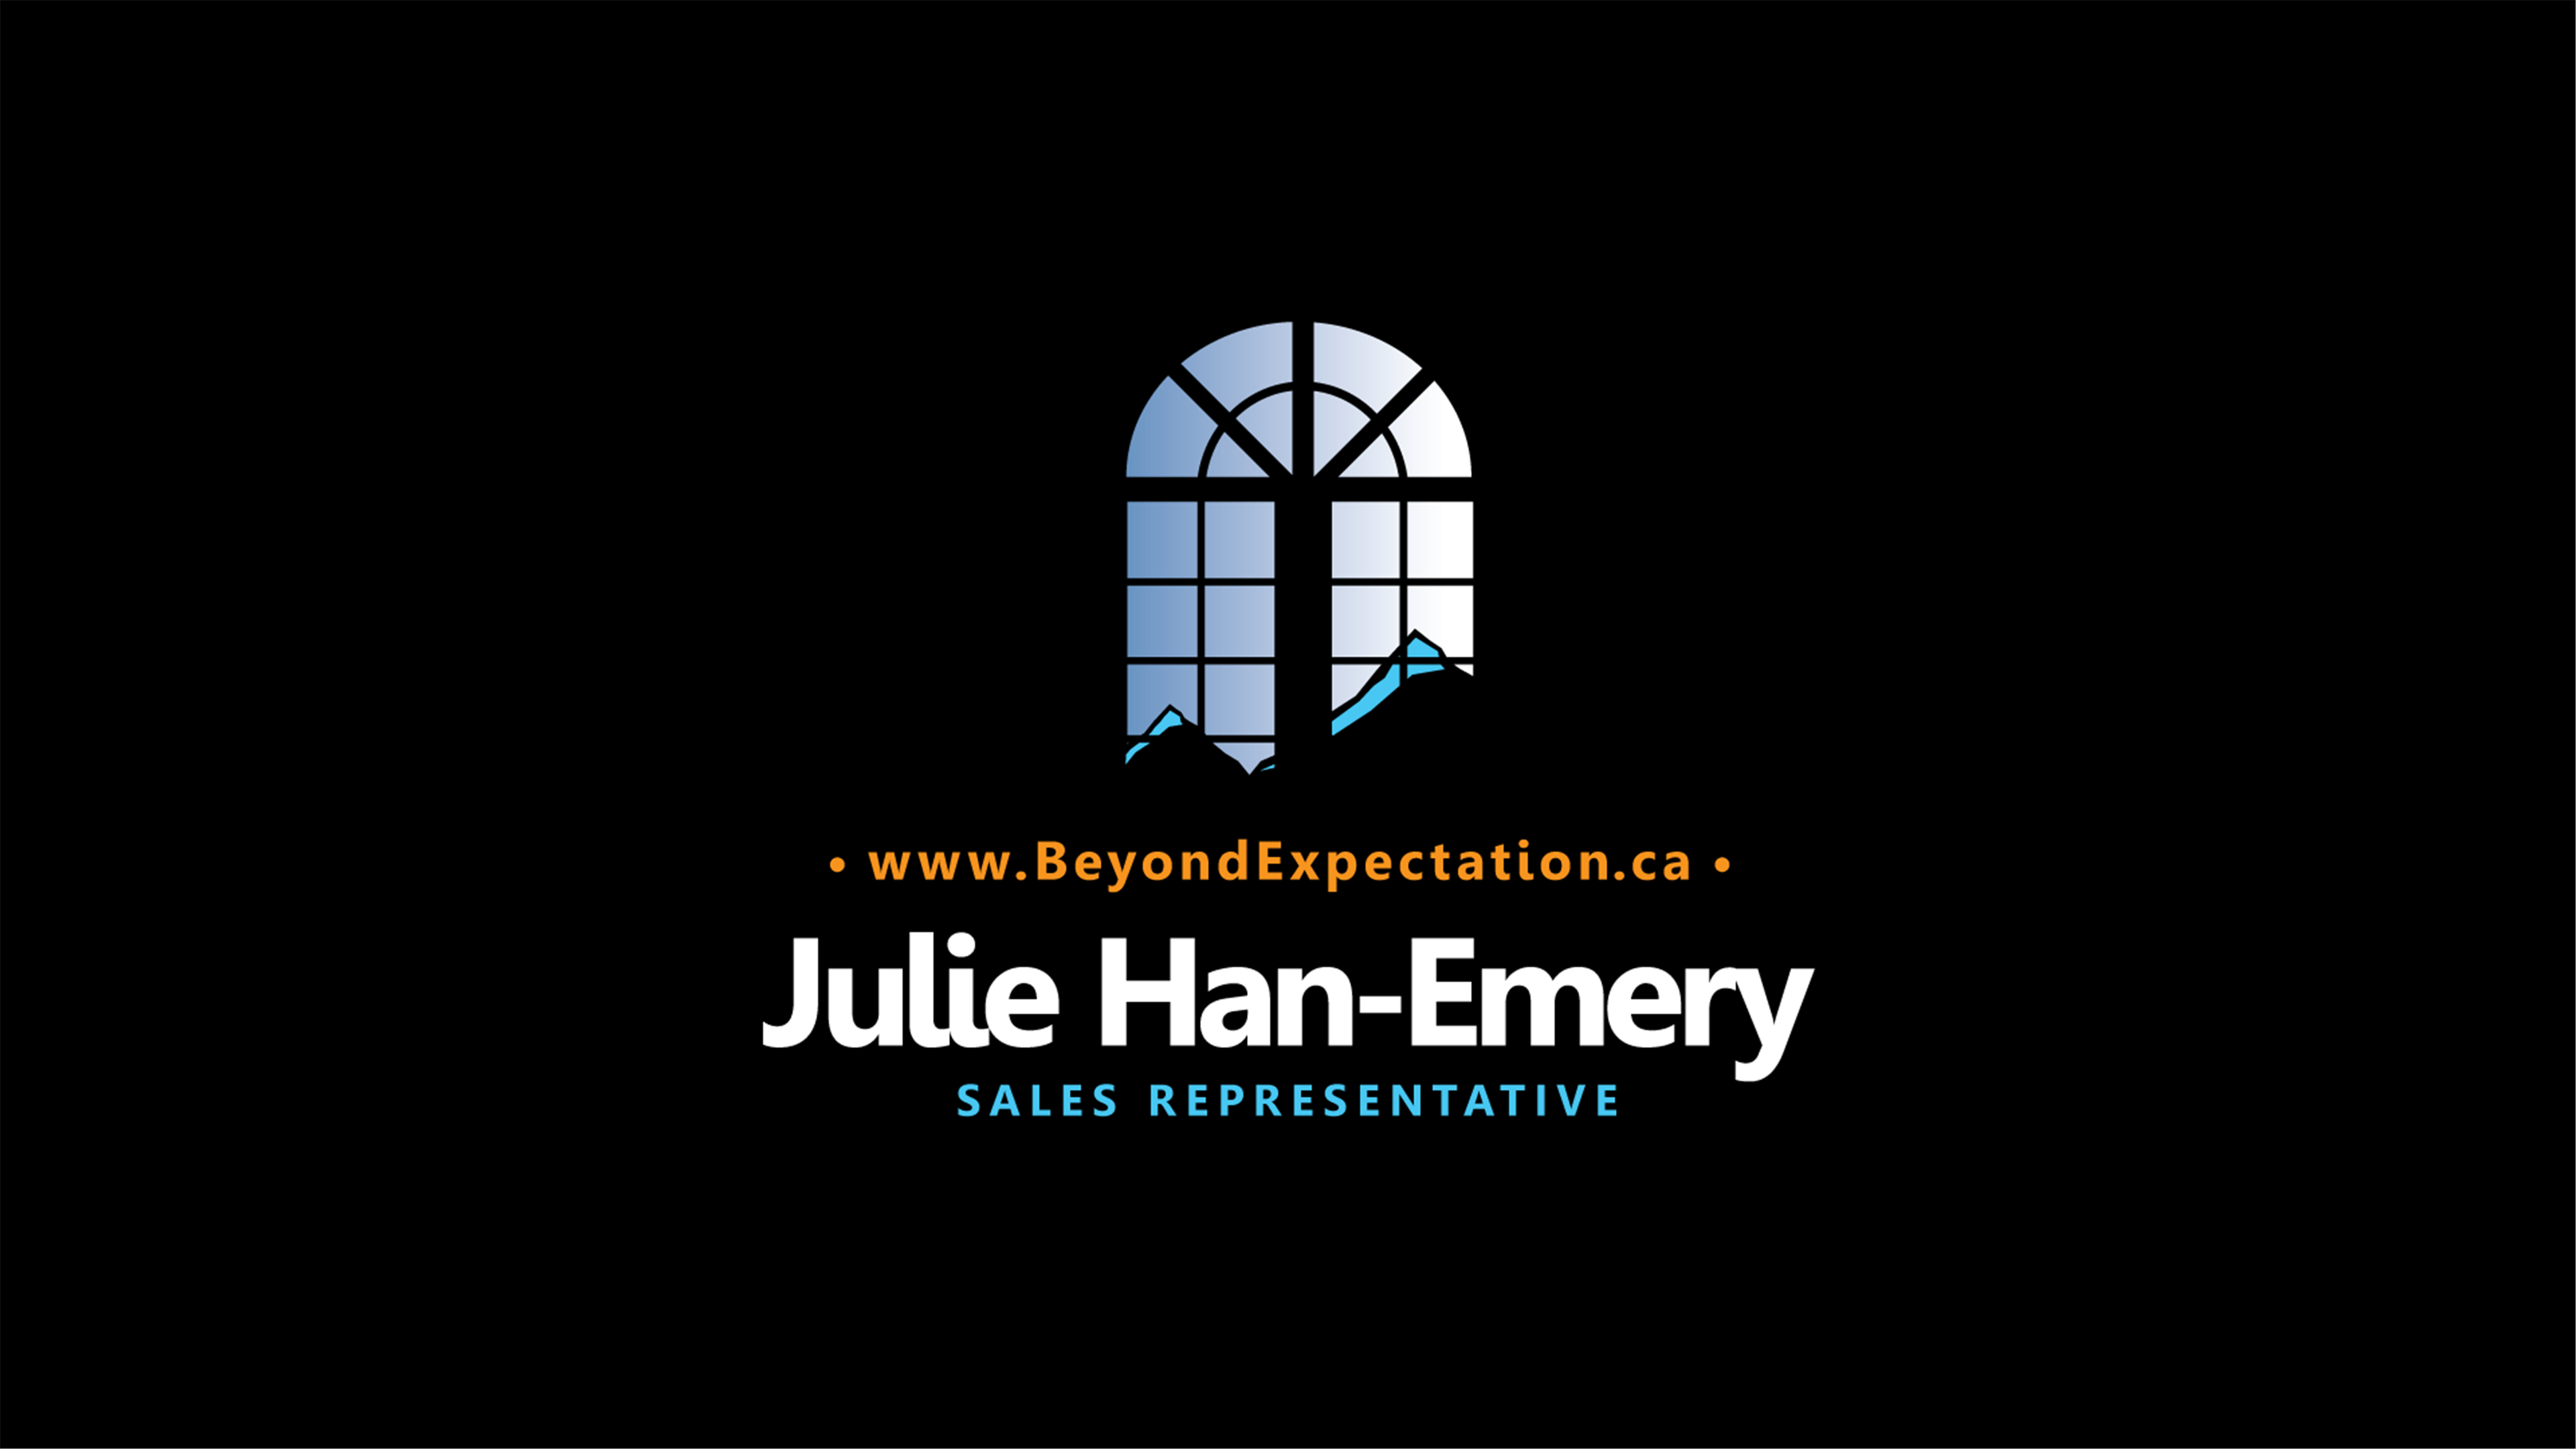 JulieHanEmery